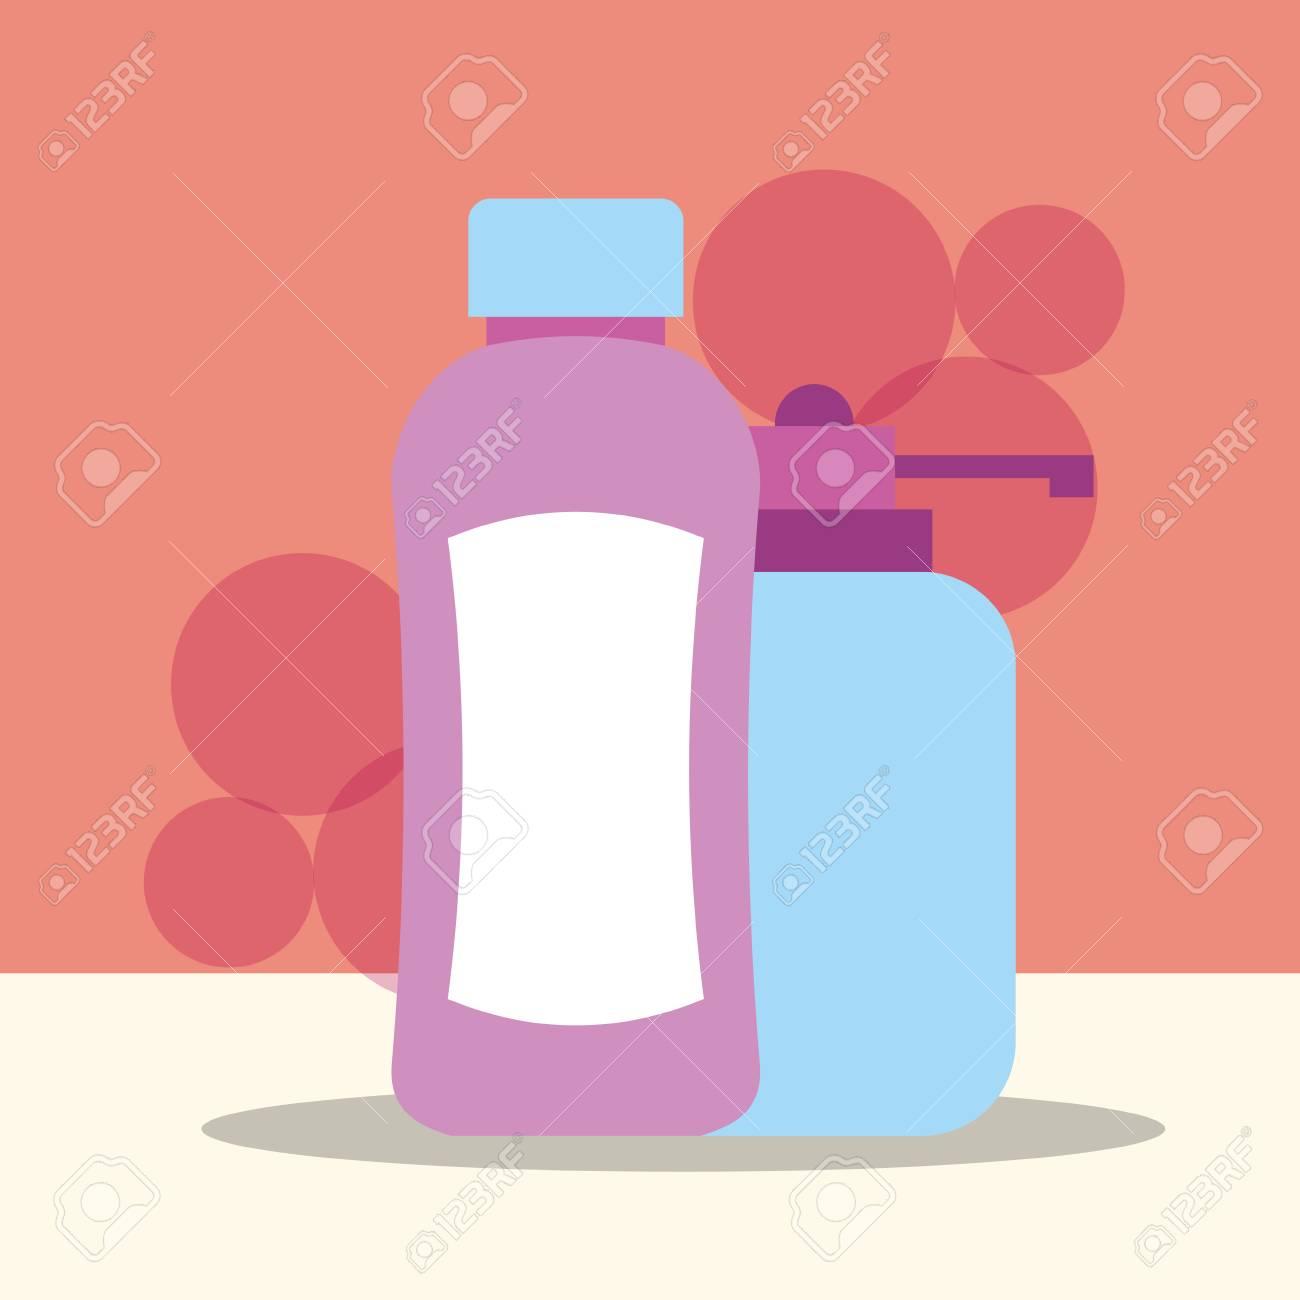 bottle shampoo and dispenser liquid soap bathroom vector illustration - 111735847